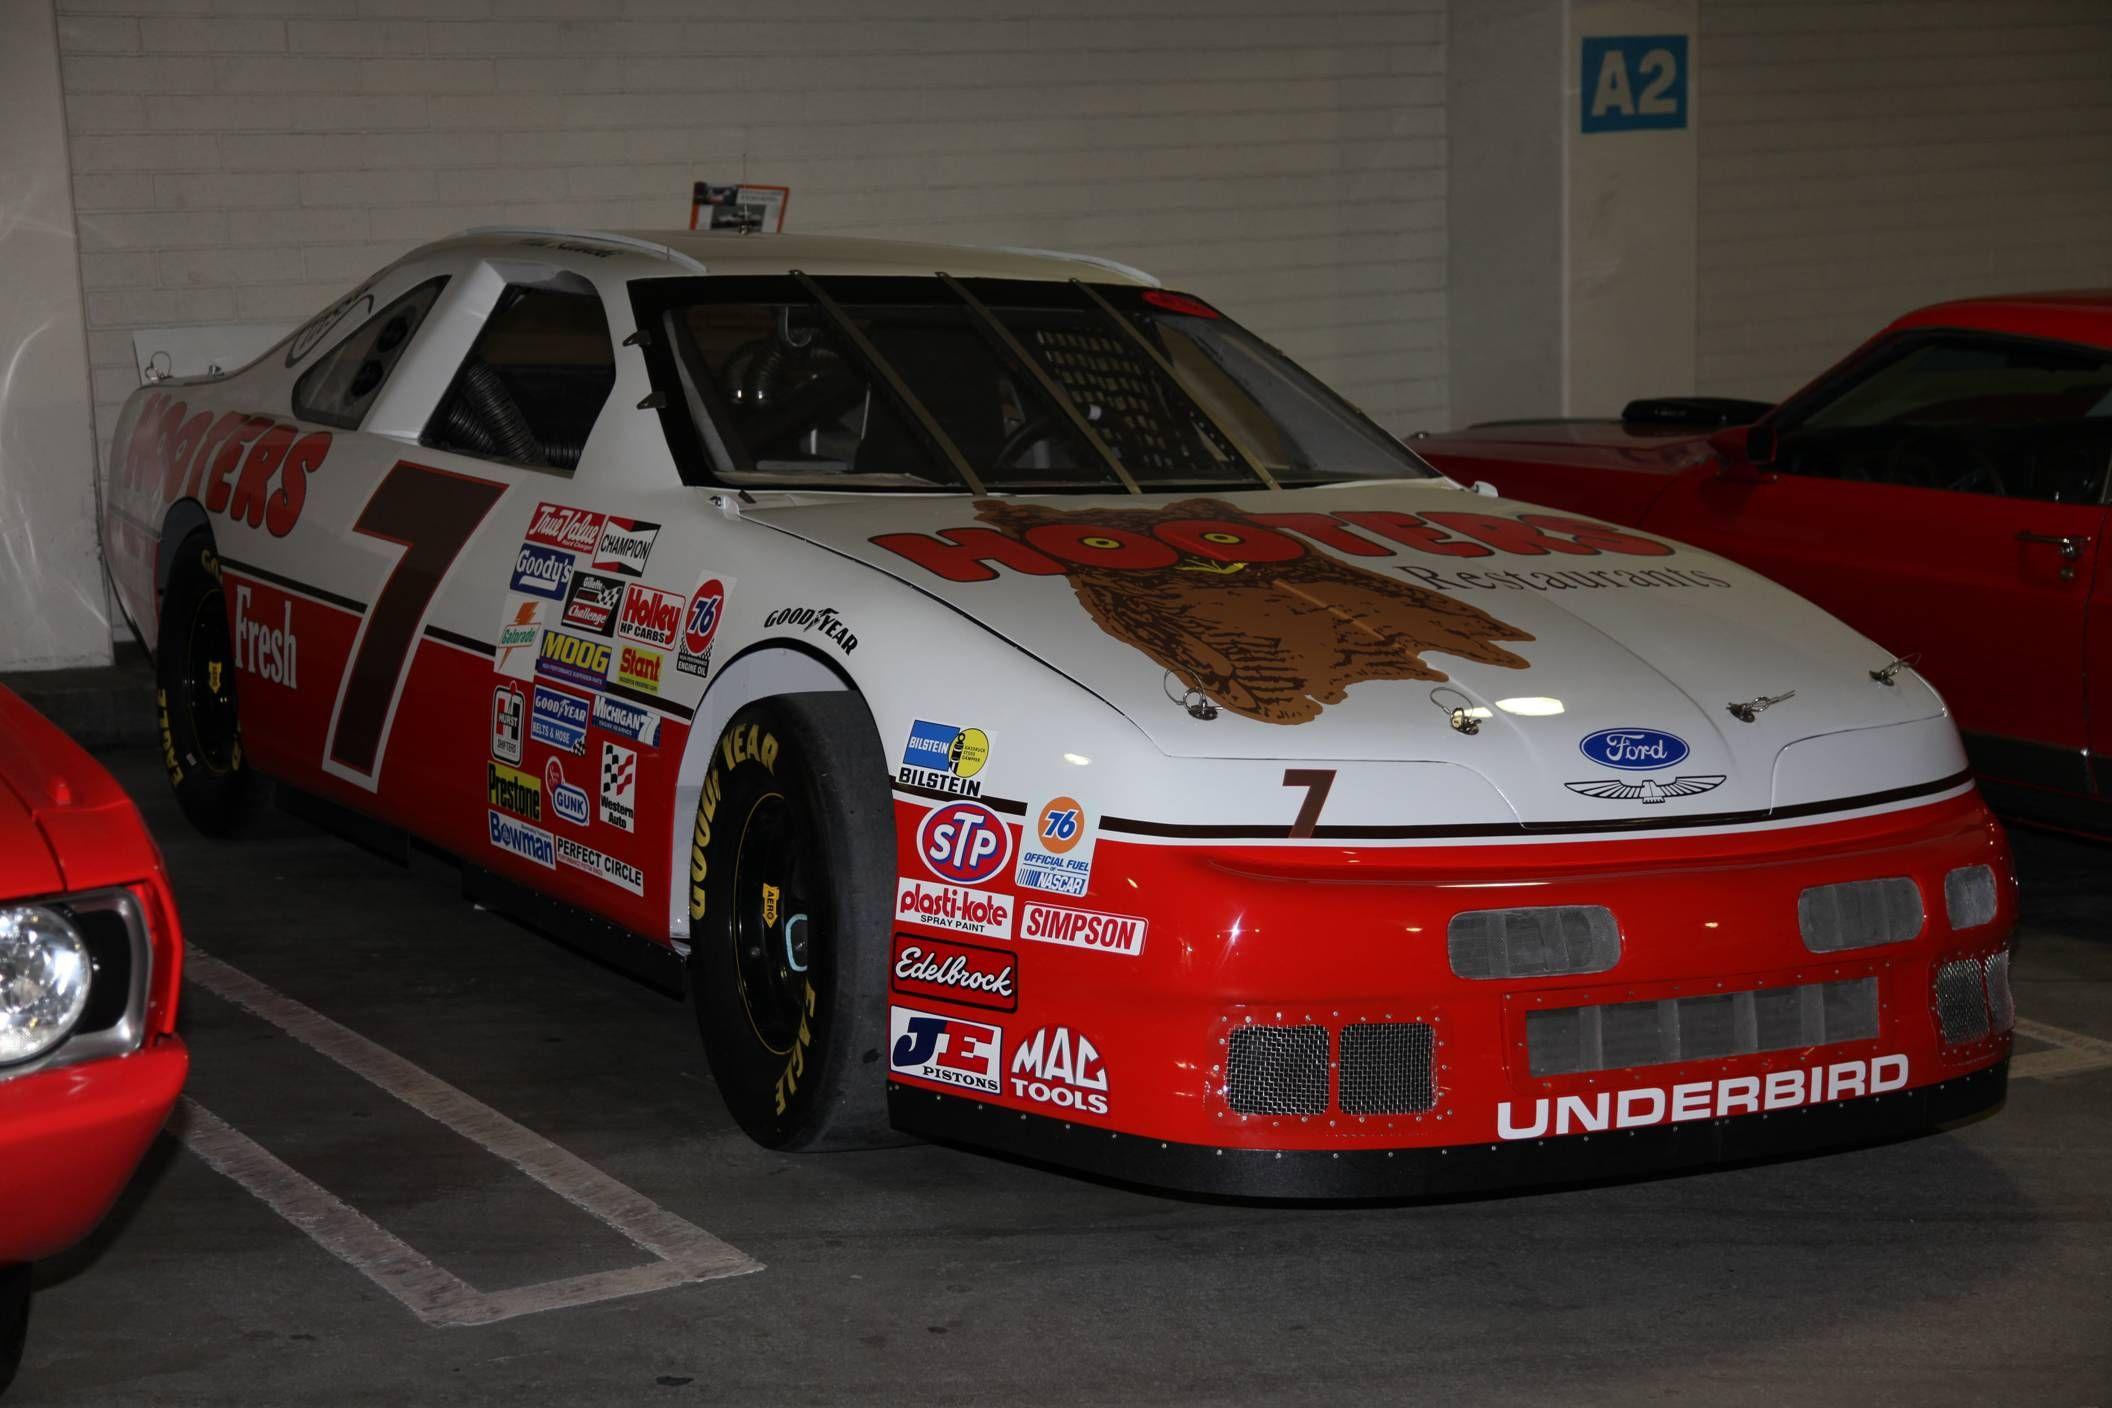 Alan Kulwicki Ford Thunderbird Race Car & Alan Kulwicki Ford Thunderbird Race Car | My Wheels | Pinterest ... markmcfarlin.com